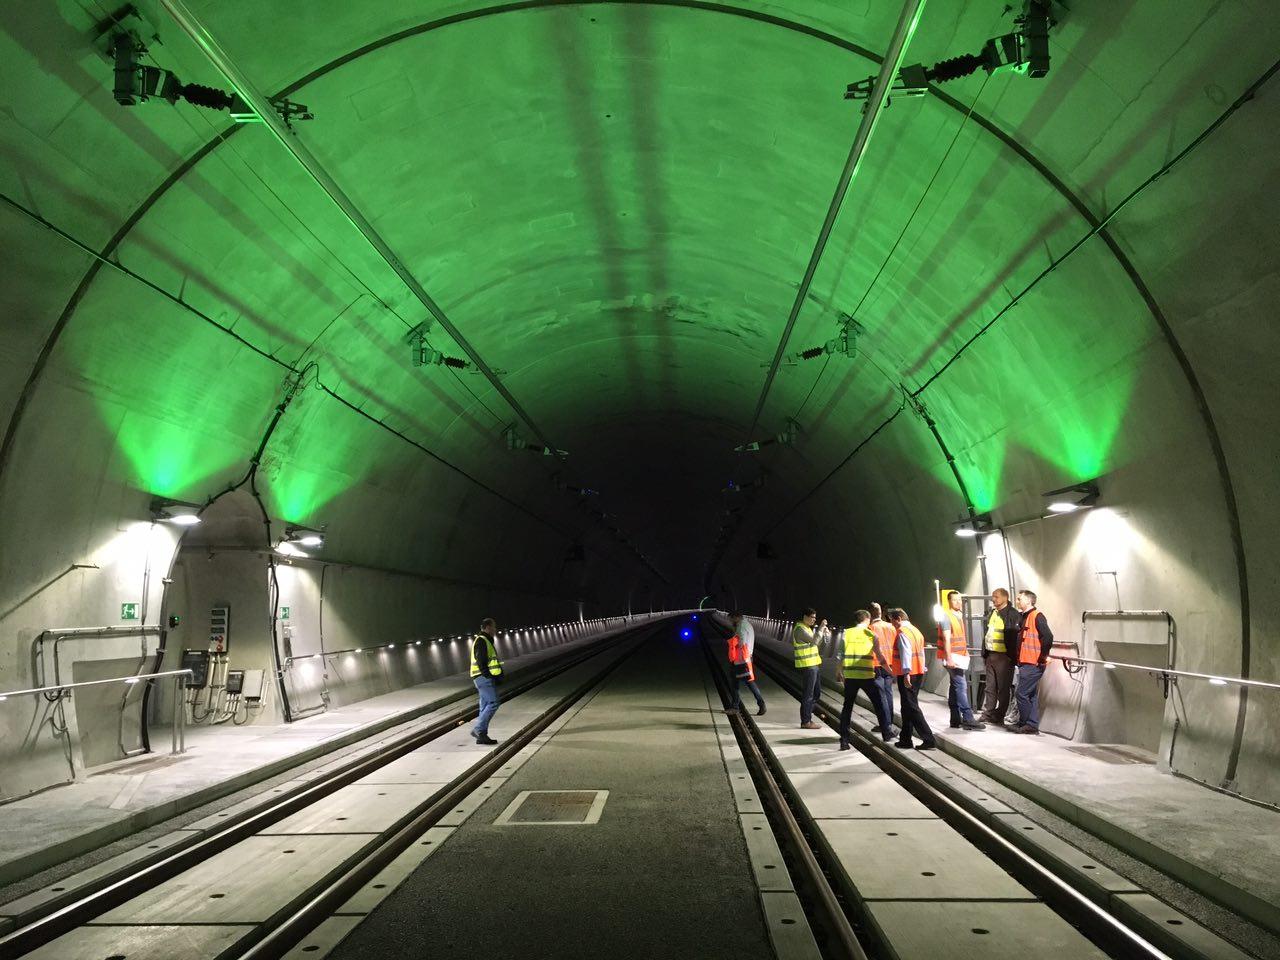 6. Tunnelsymposium in Bellinzona